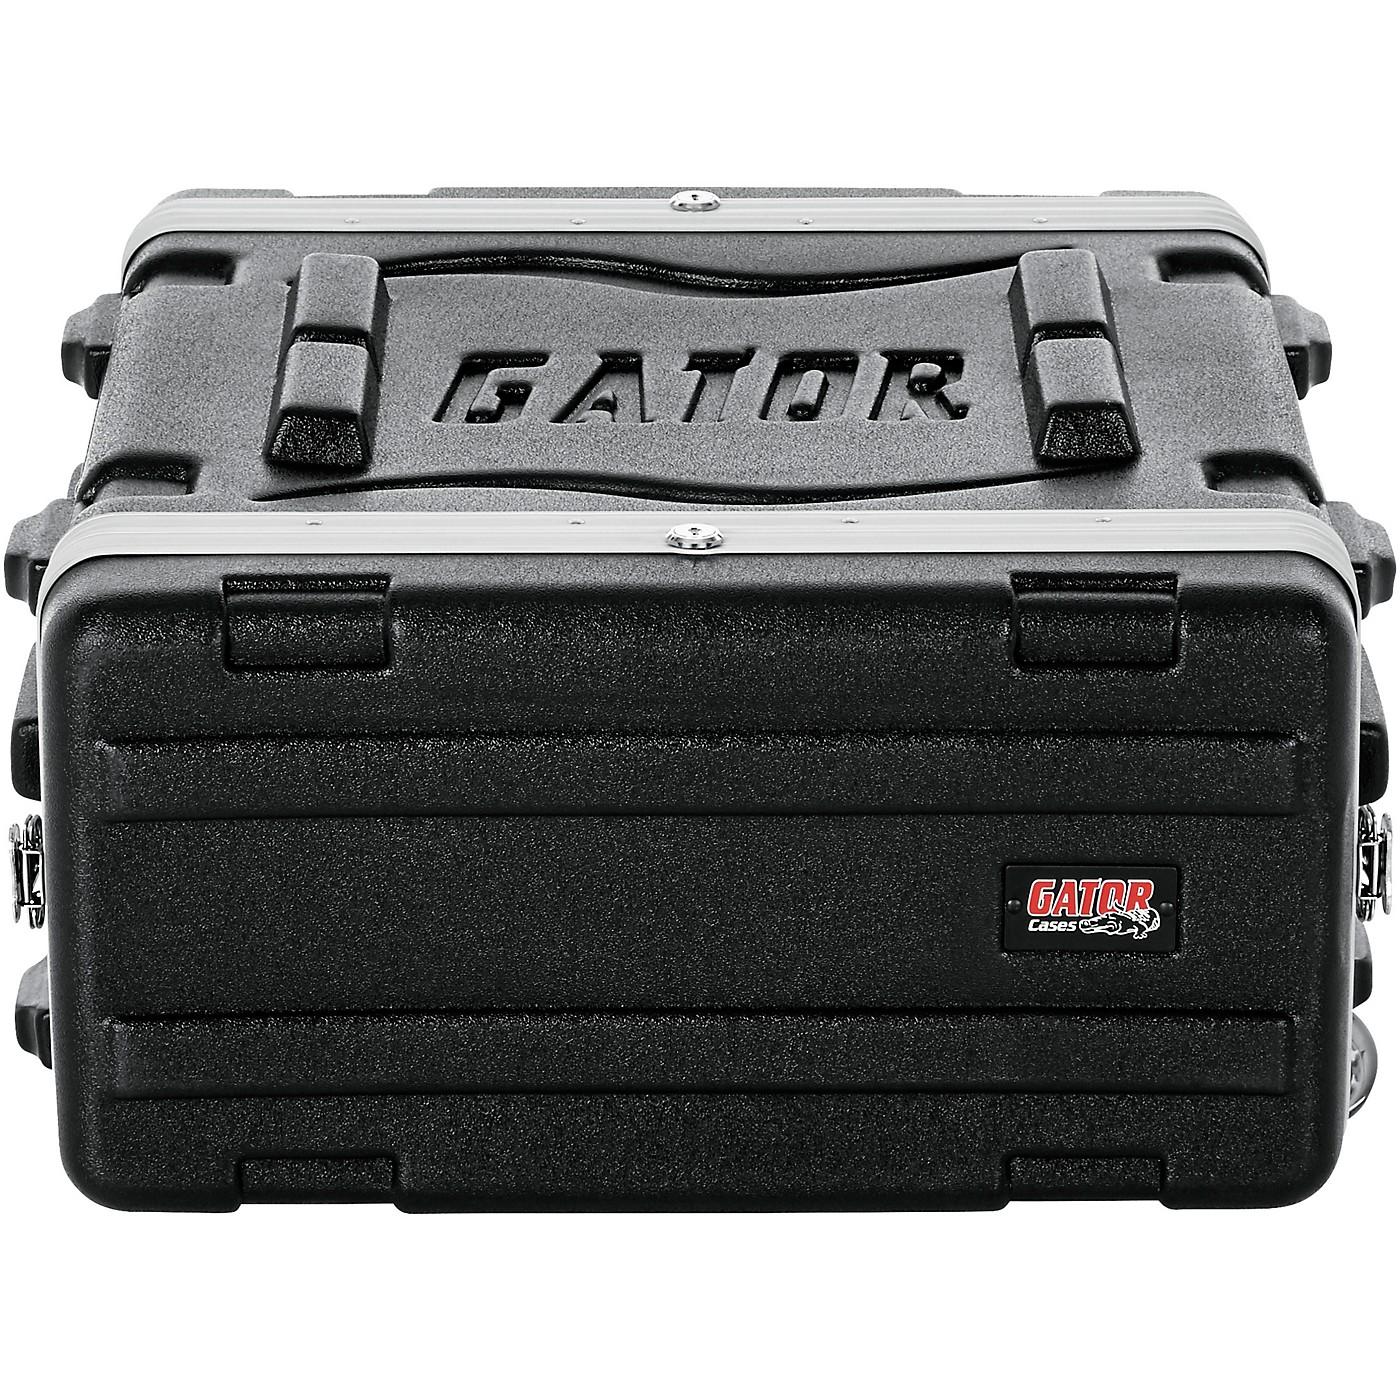 Gator GRR-4L Rolling ATA-Style Deluxe Rack Case thumbnail